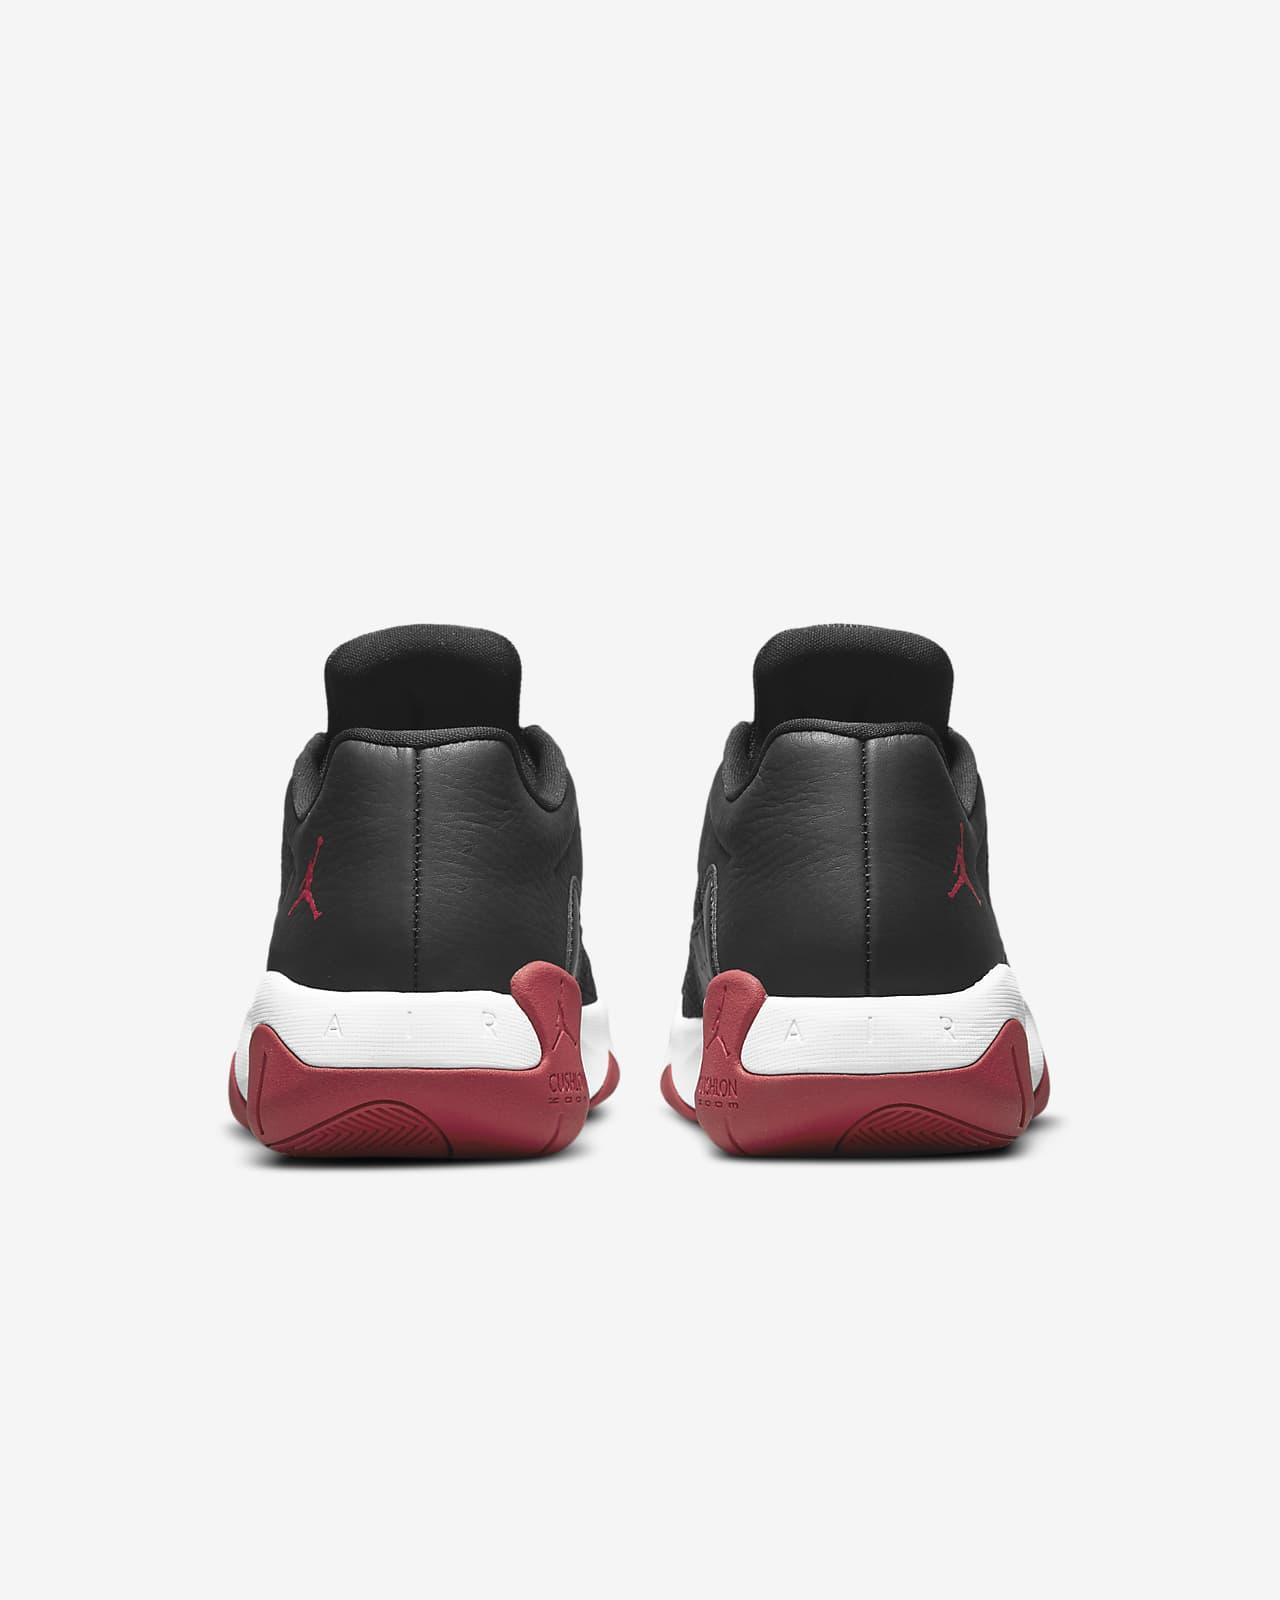 Chaussure Air Jordan 11 CMFT Low pour Homme. Nike LU